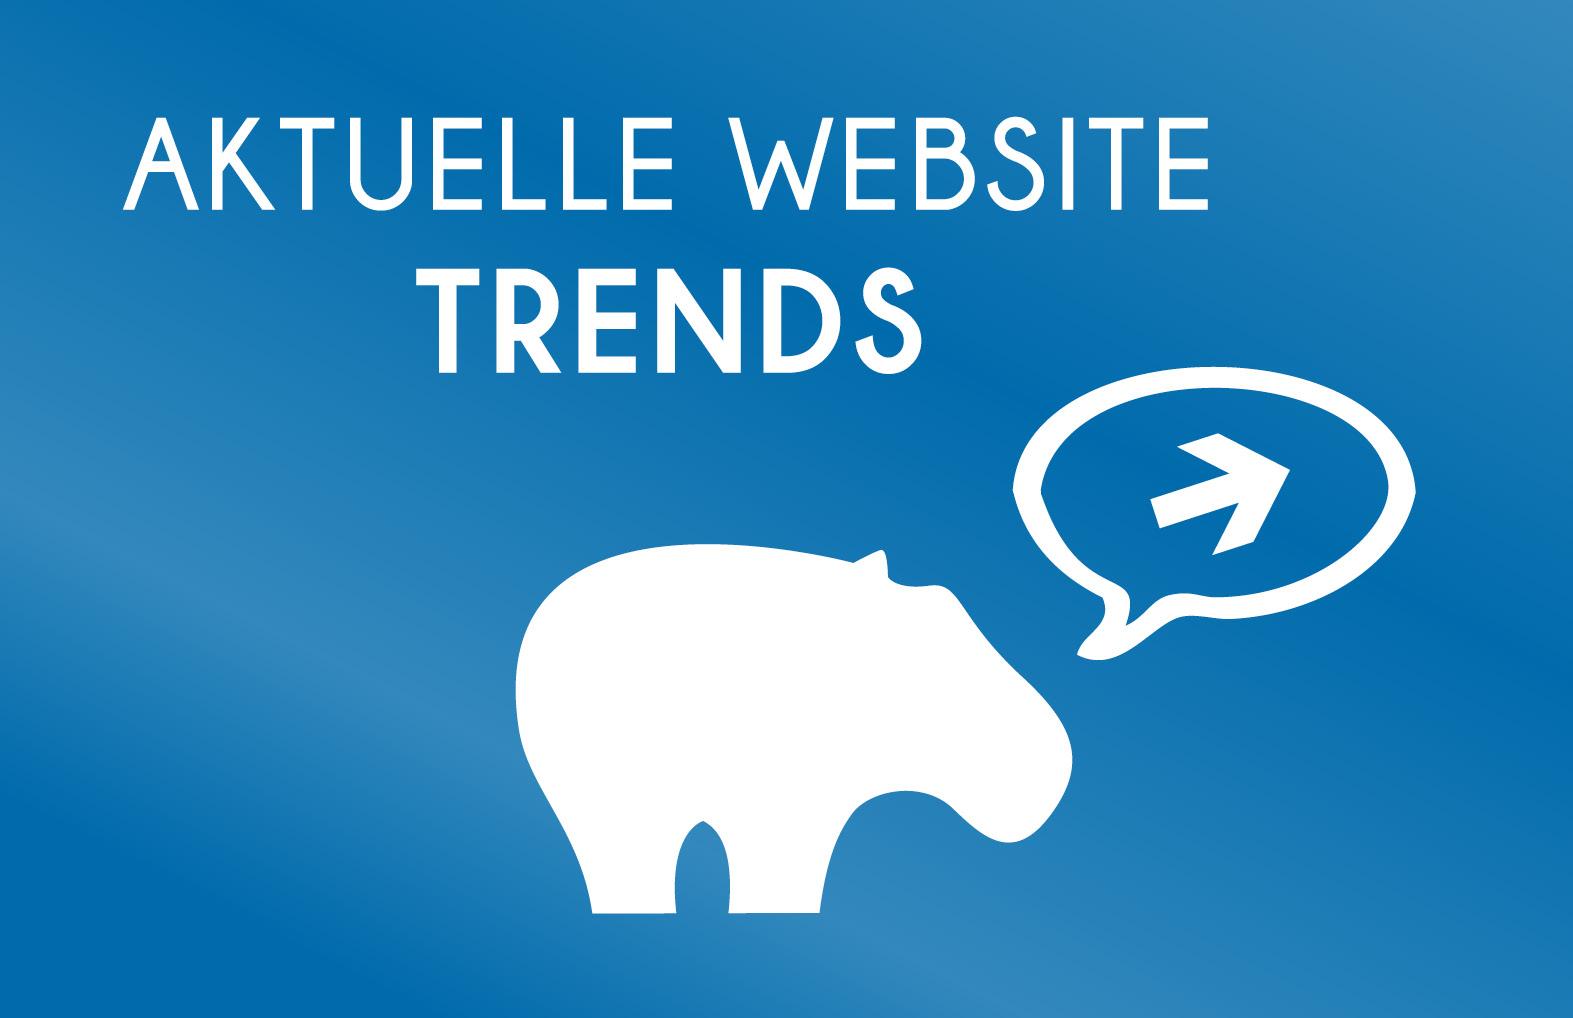 Aktuelle Website Trends 2021 - Blue Hippo Tipps